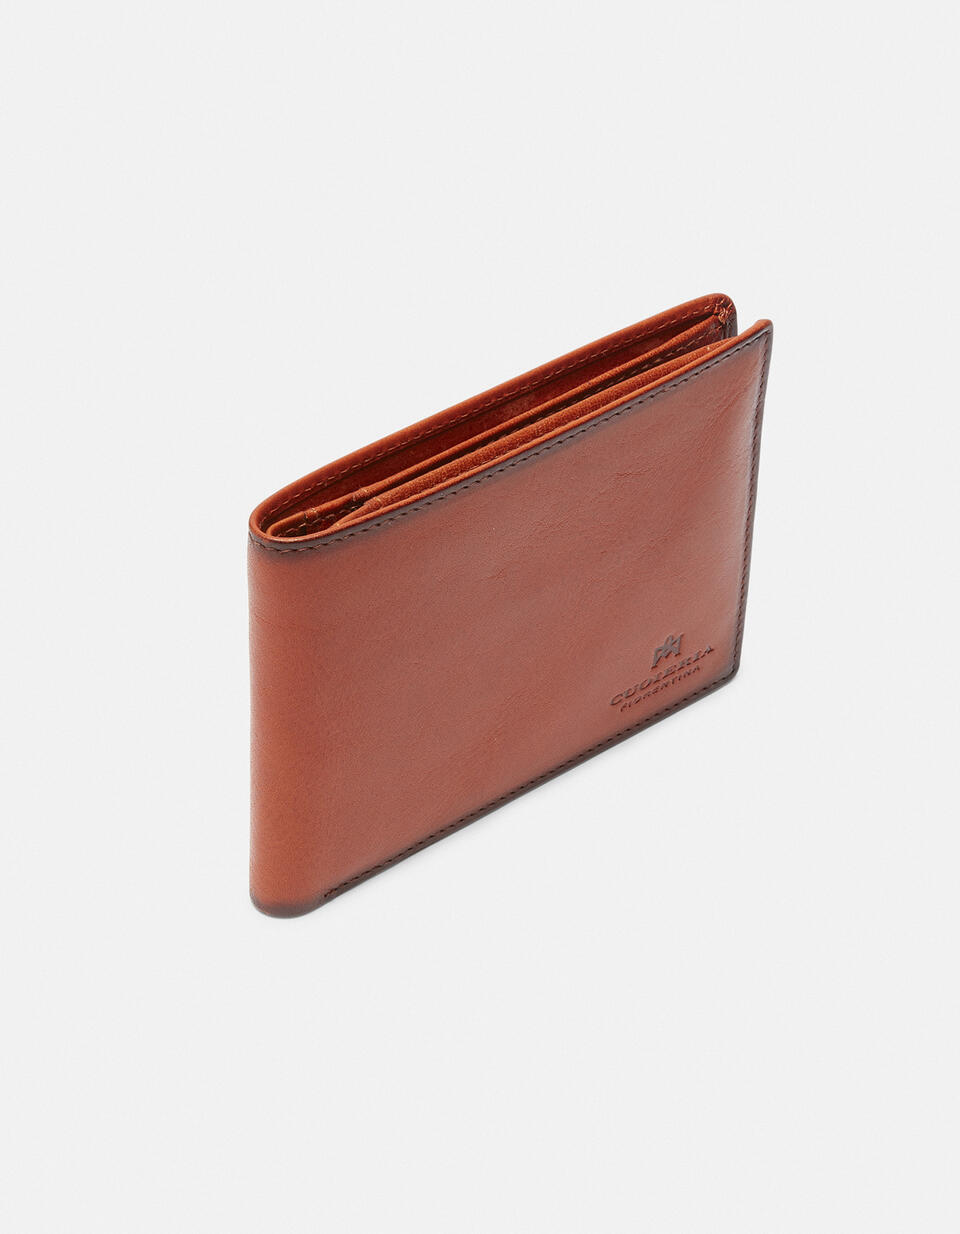 Leather Warm and Color Anti-RFid Wallet ARANCIO Cuoieria Fiorentina